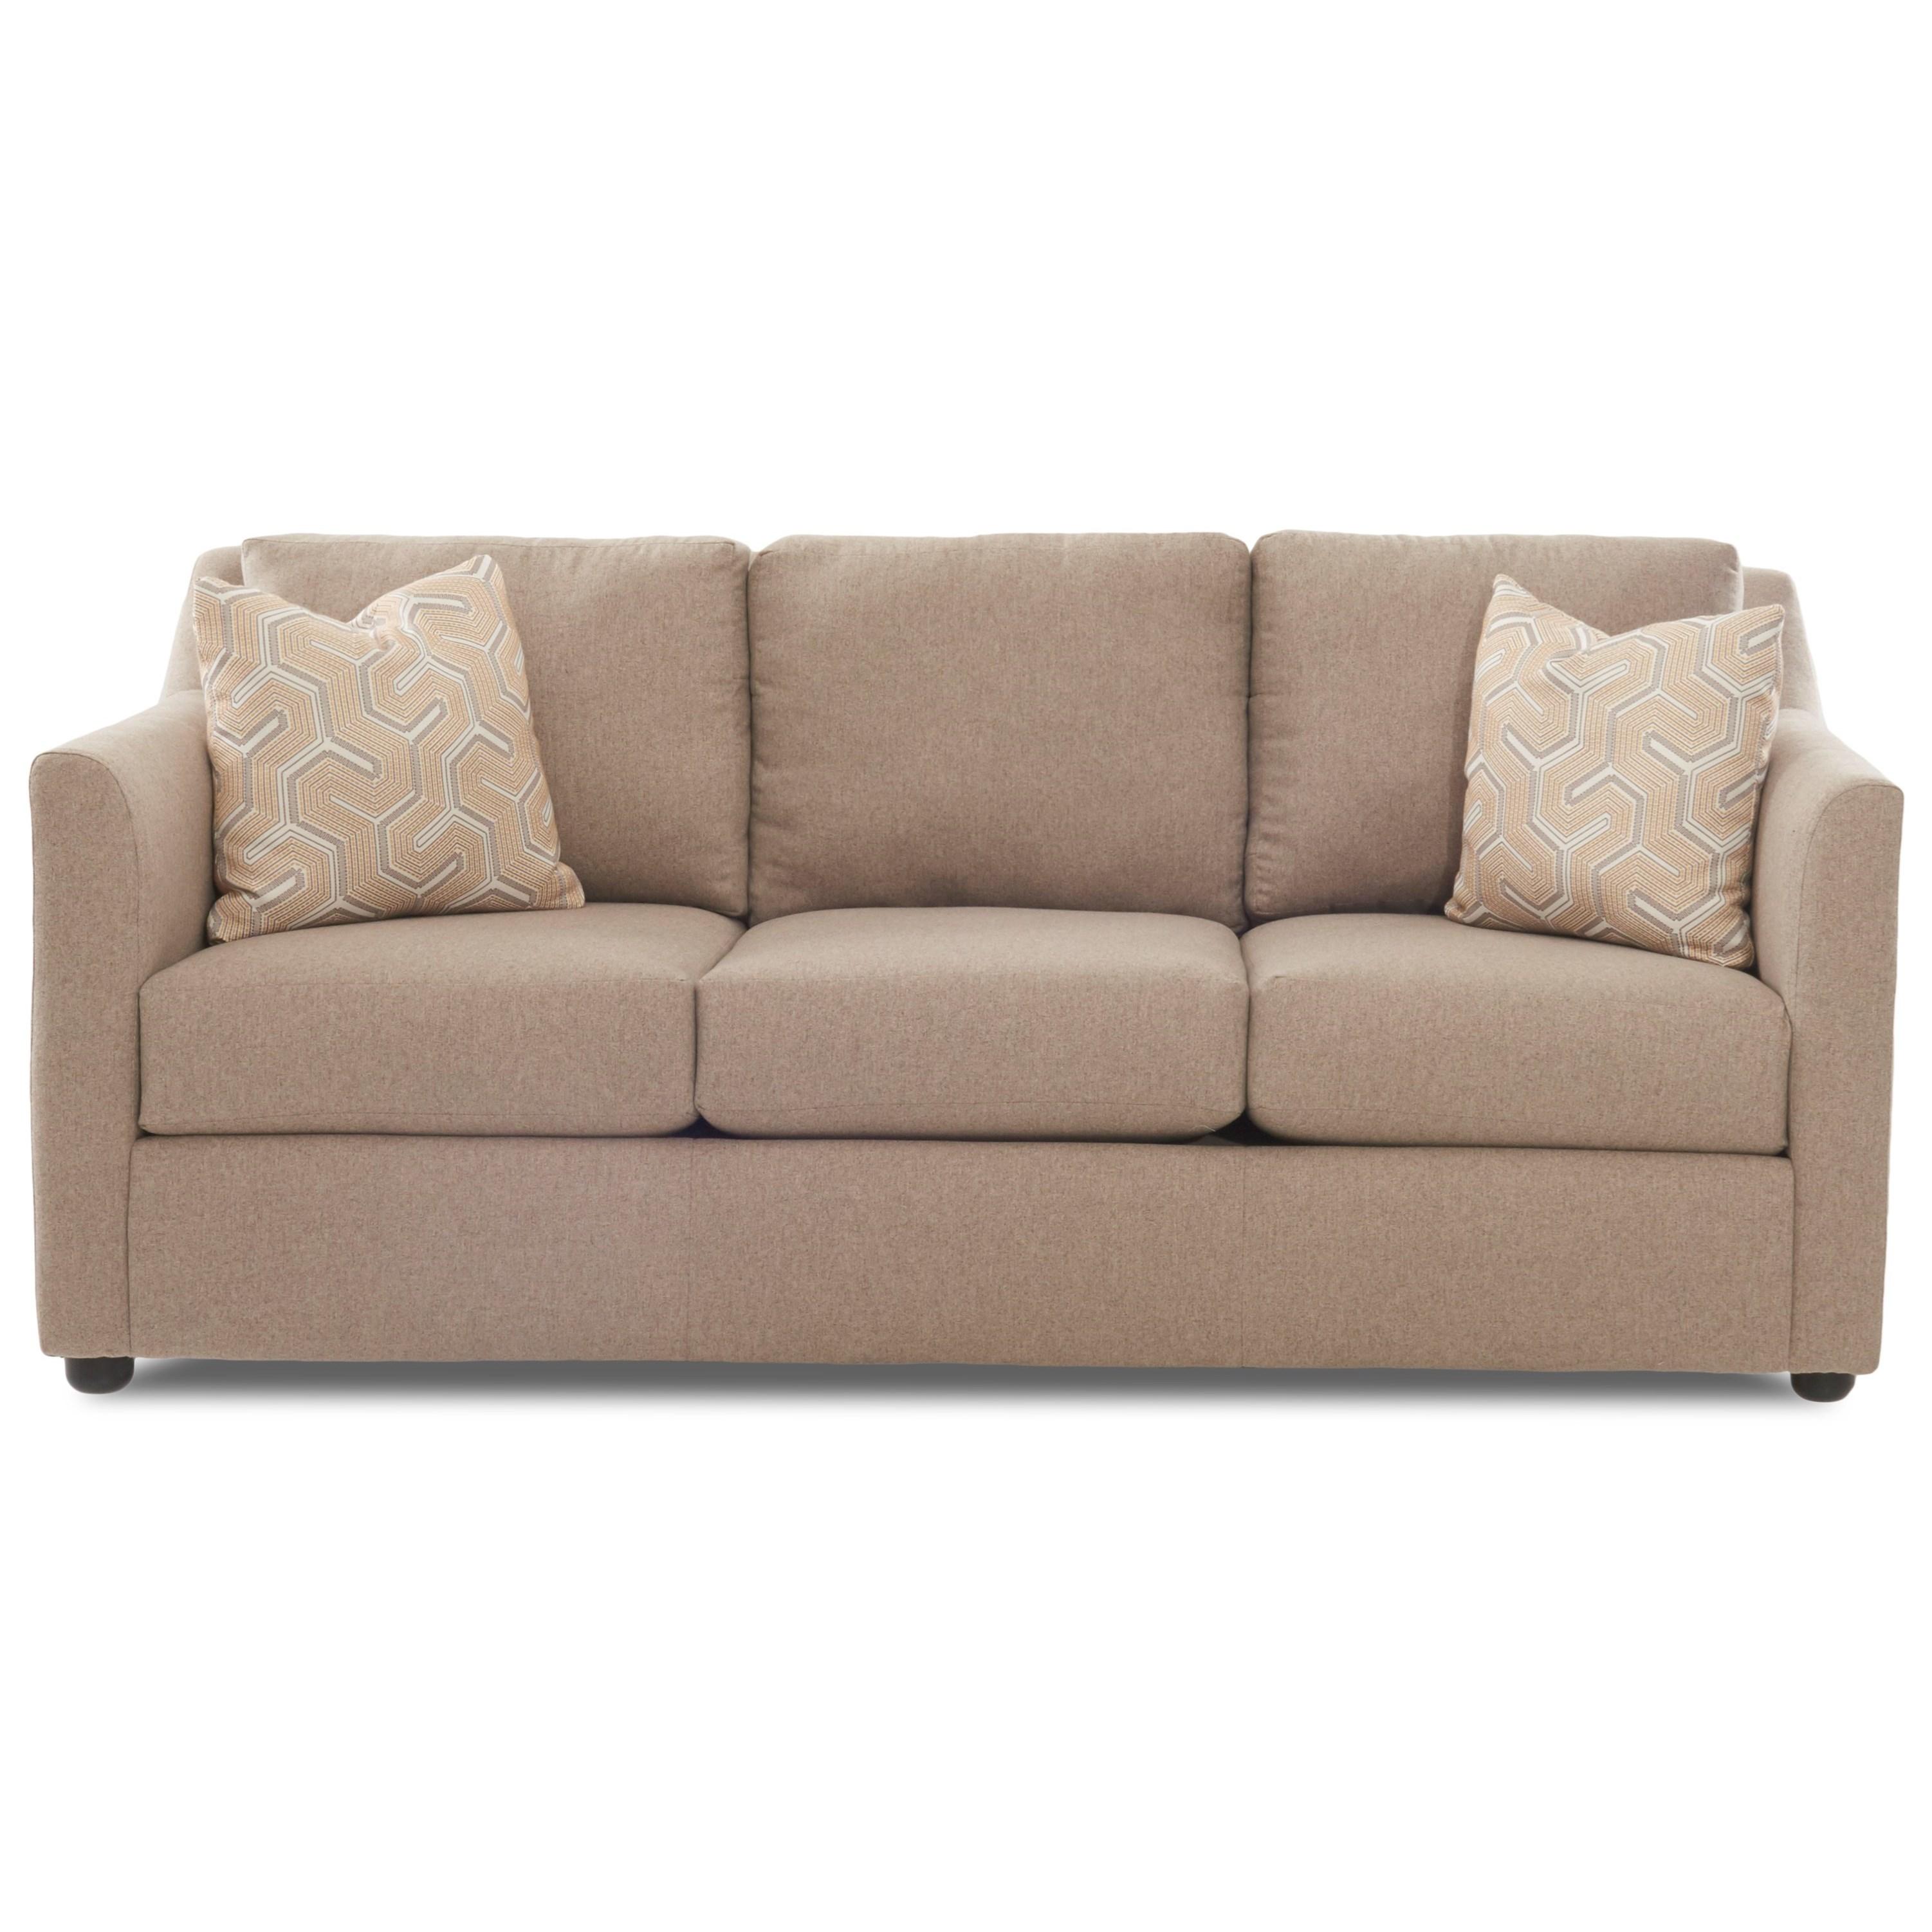 Klaussner Del MarEnso Foam Sofa Sleeper ...